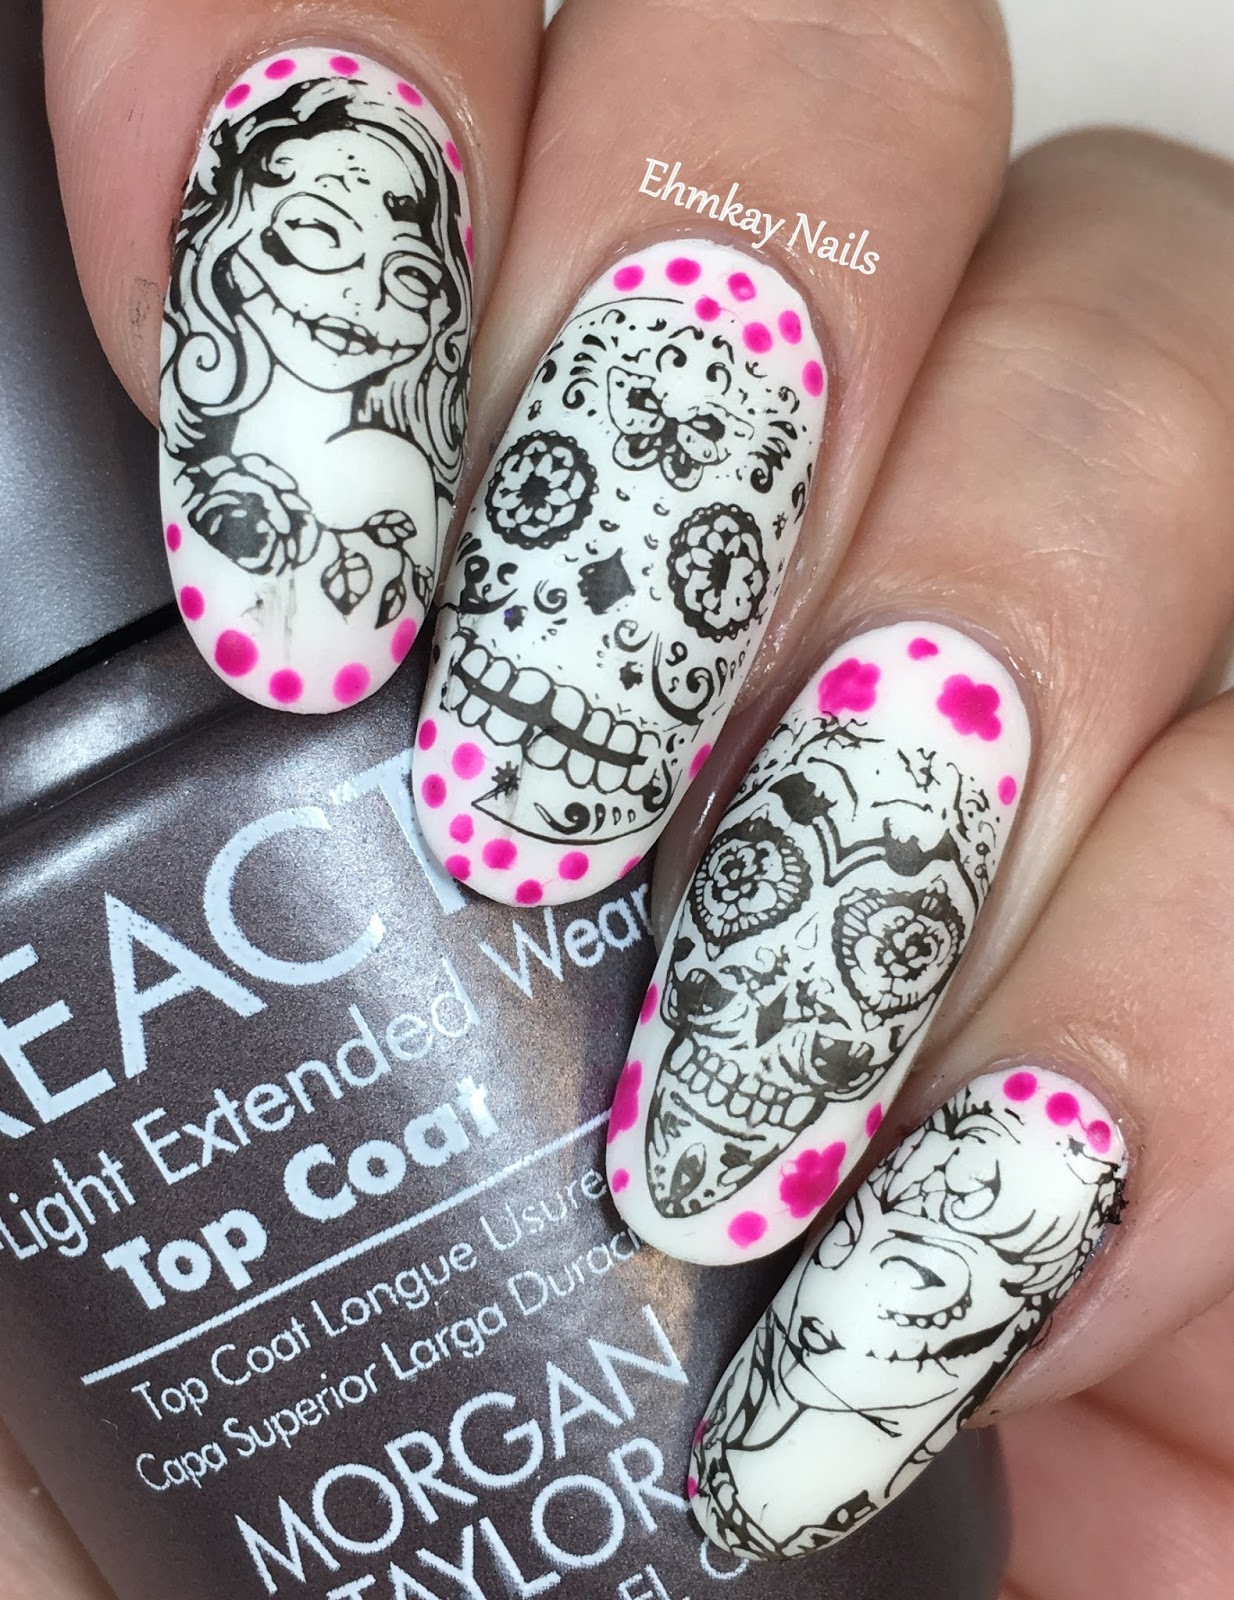 Ehmkay nails halloween nail art glow in the dark sugar skull halloween nail art glow in the dark sugar skull nail art with morgan taylor dia de los muertos prinsesfo Images